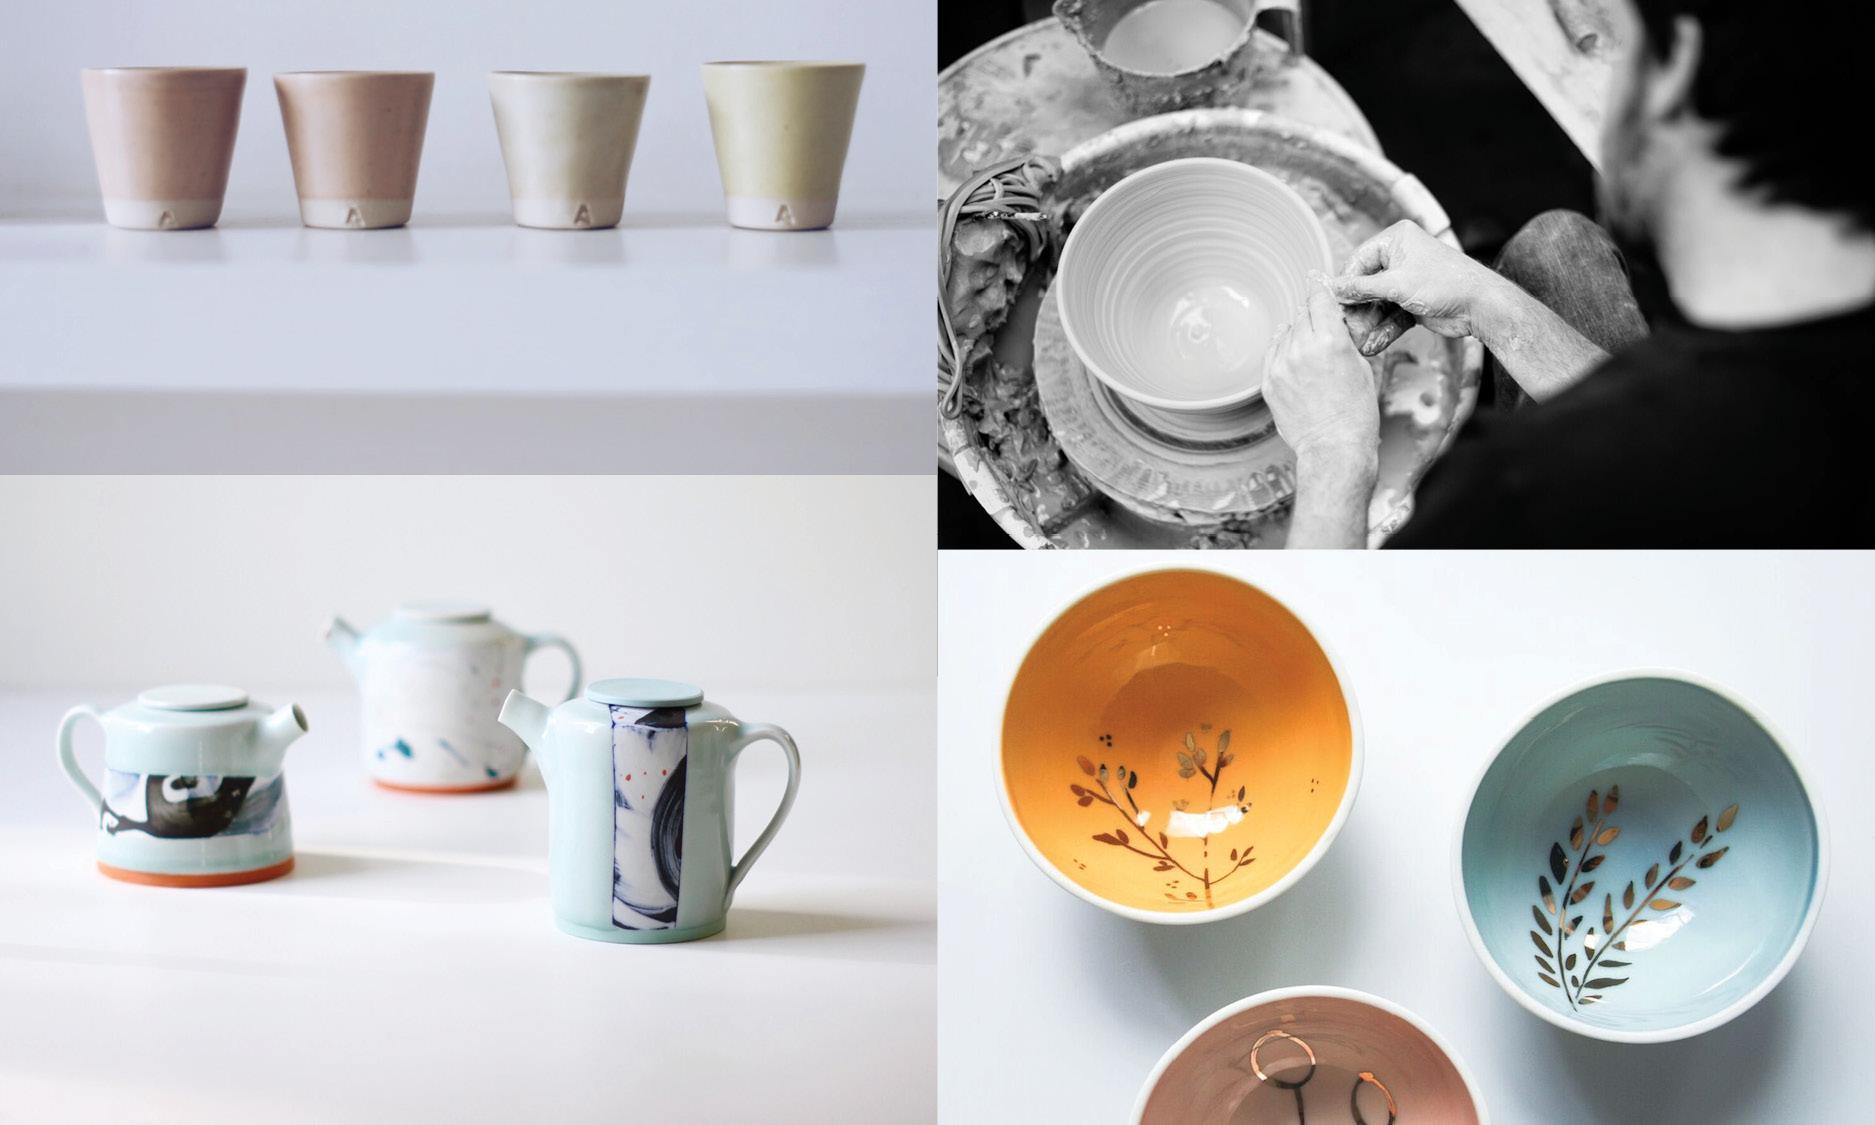 Clockwise from top left: Arran Street East, Diem Pottery, KaroArt,Adam Frew Ceramics.